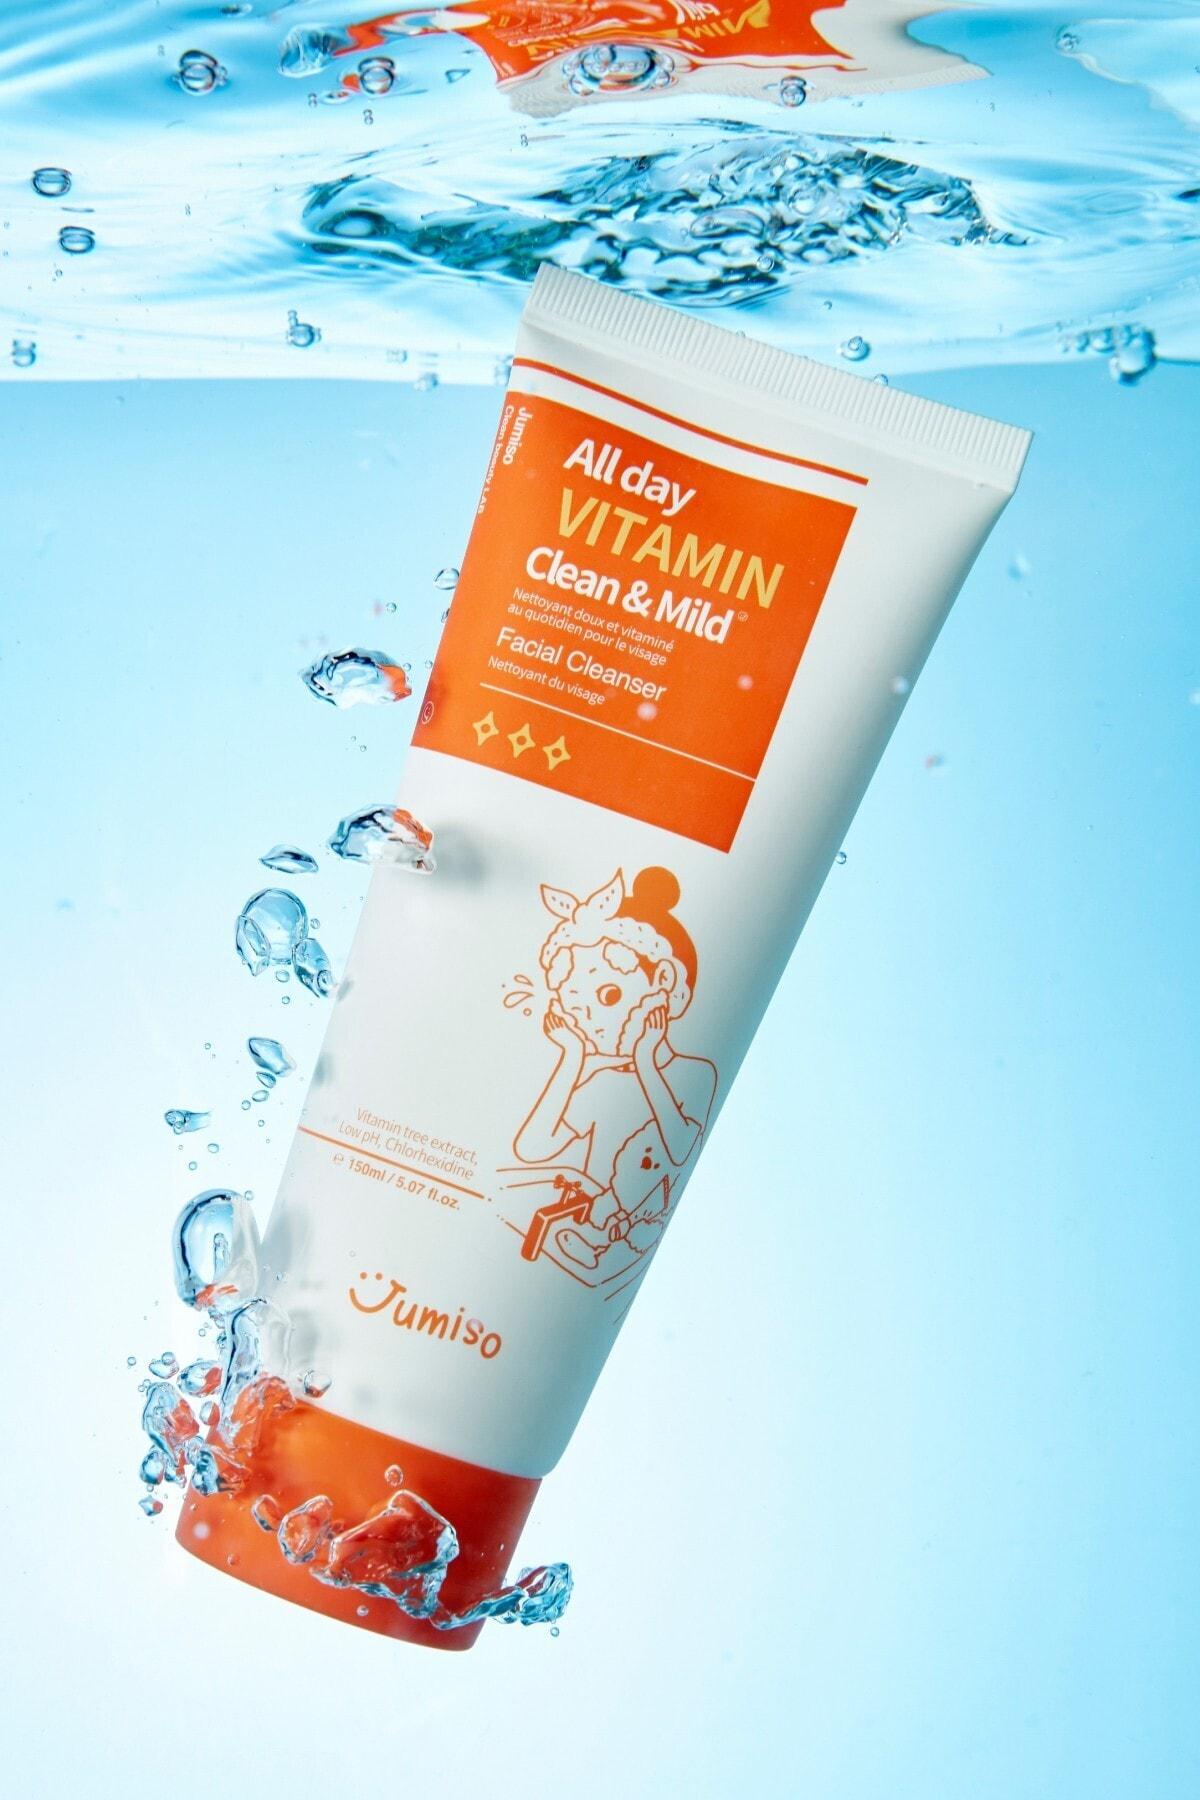 Jumiso All Day Vitamin Clean Mild Facial Cleanser 150 ml 2